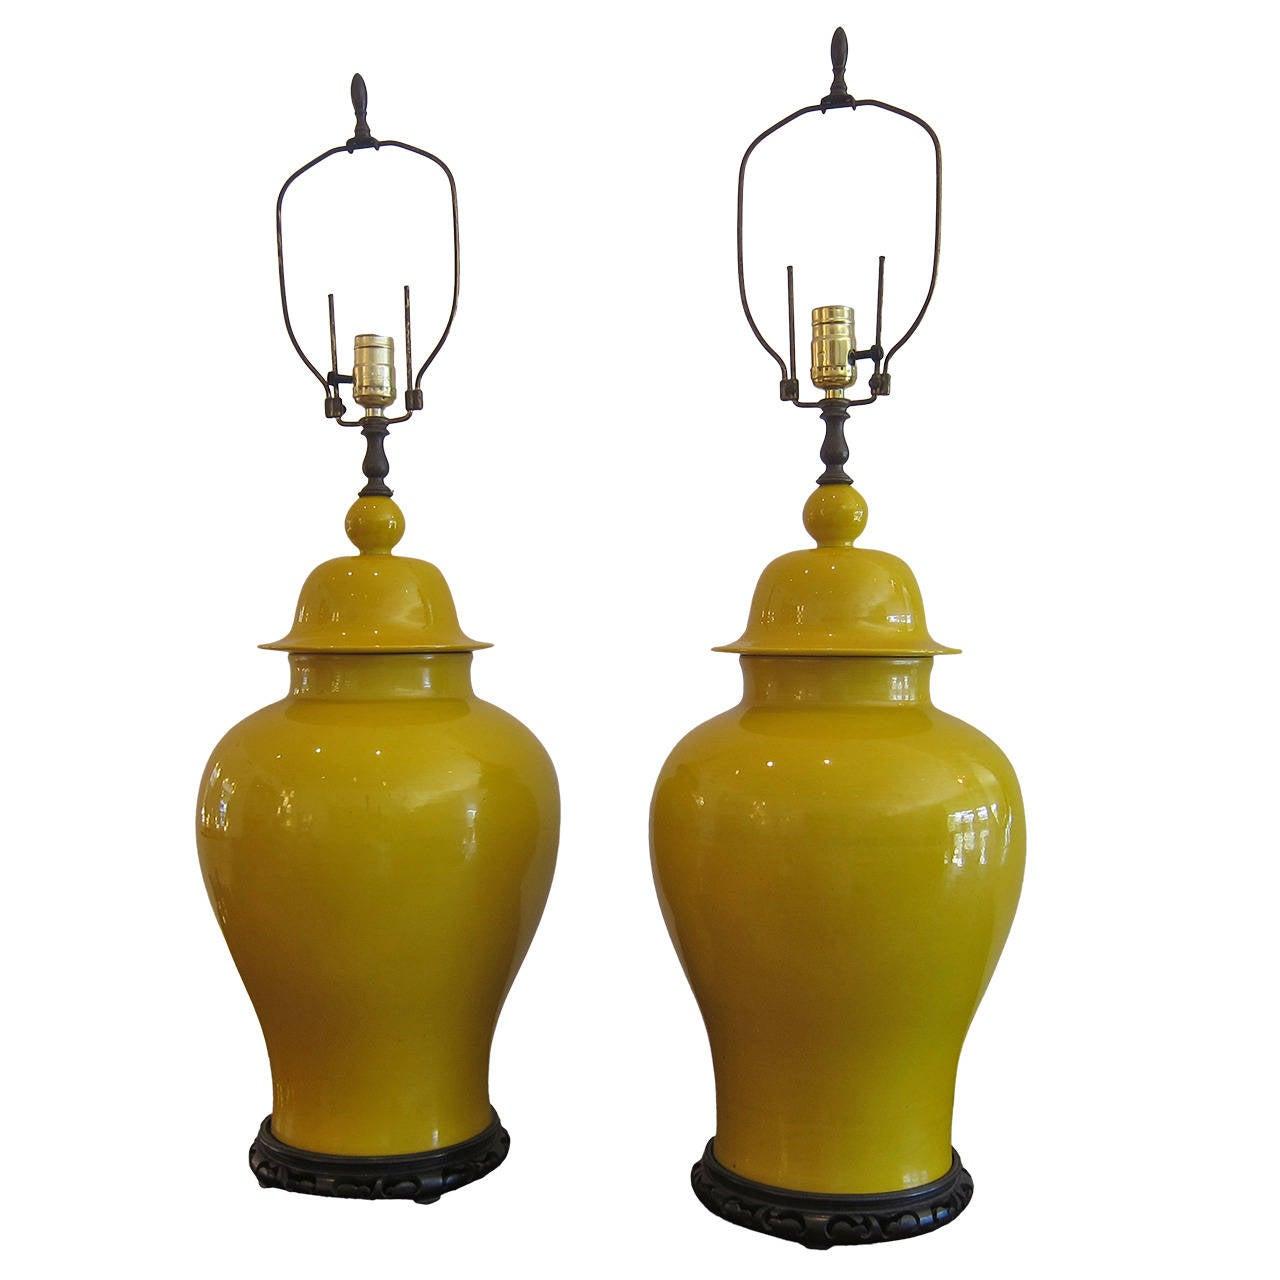 Mid century ginger jar lamp pair at 1stdibs - Pair Of Ginger Jar Ceramic Lamps At 1stdibs